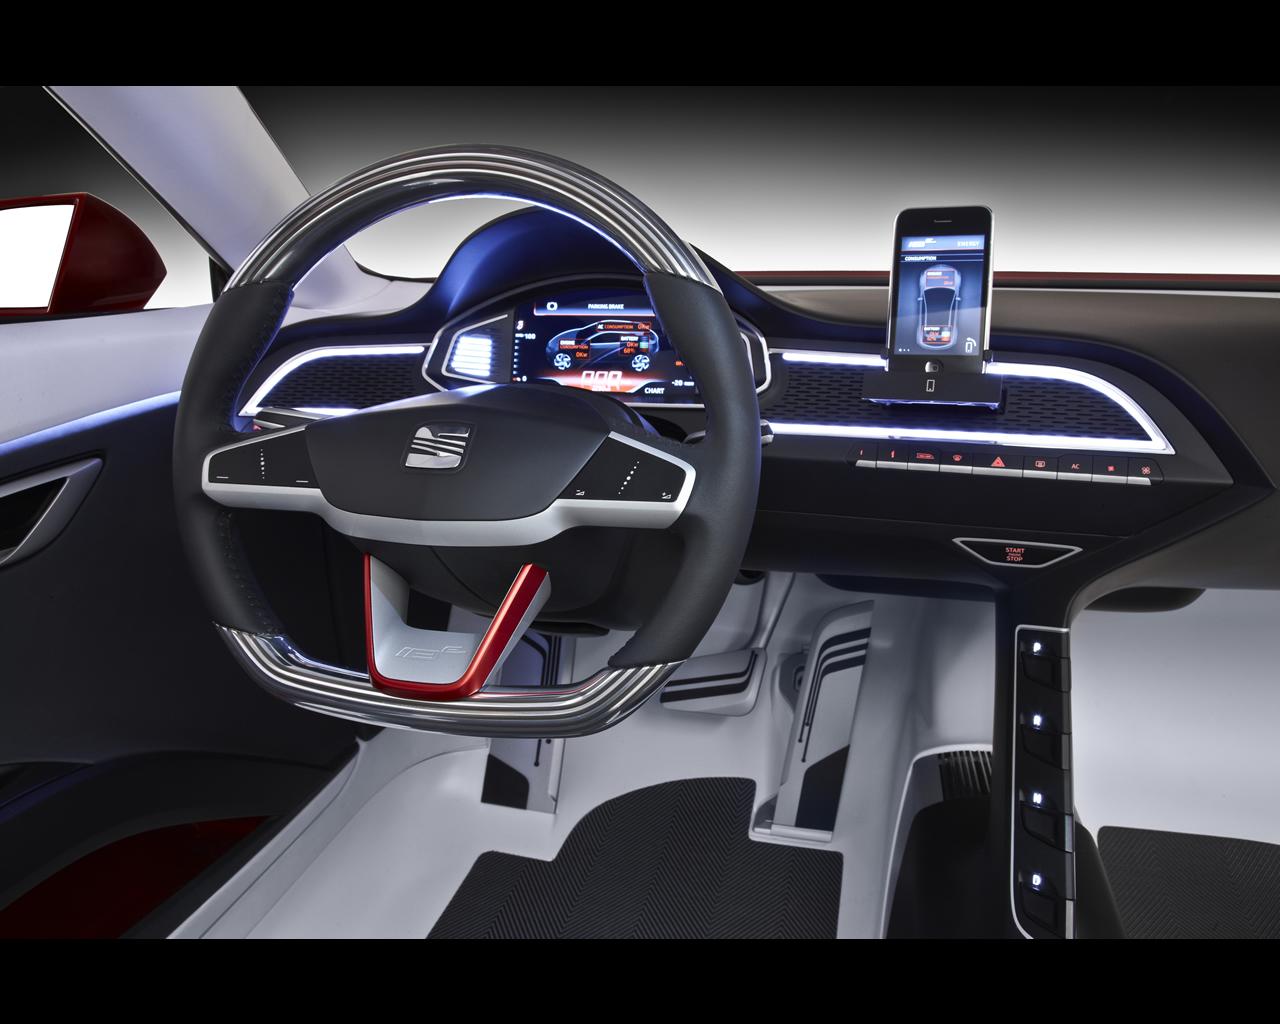 seat ibe concept paris 2010 sports coup zero emissions. Black Bedroom Furniture Sets. Home Design Ideas